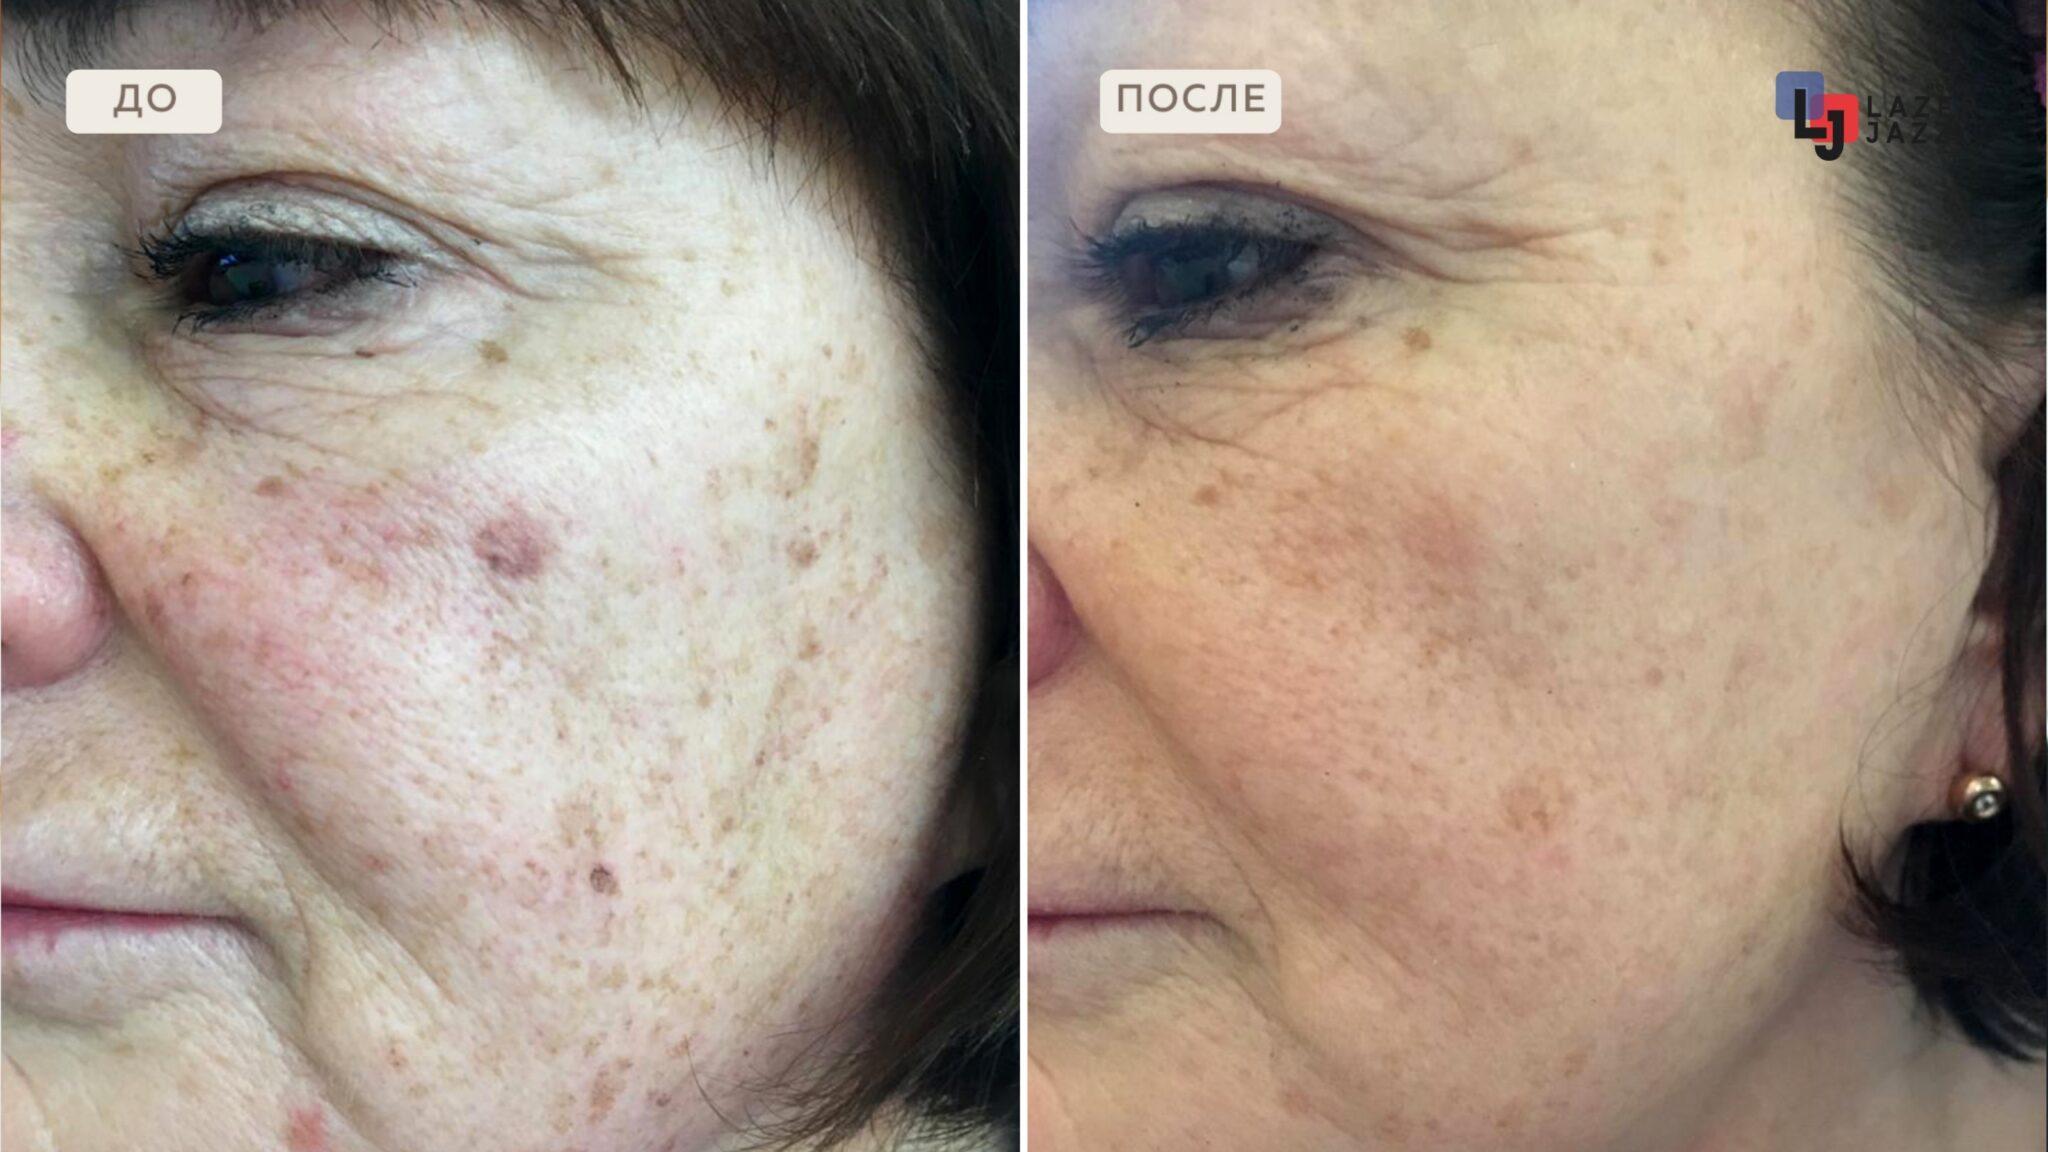 Lechenie-pigmentacii-pacientka-48-let-scaled-1